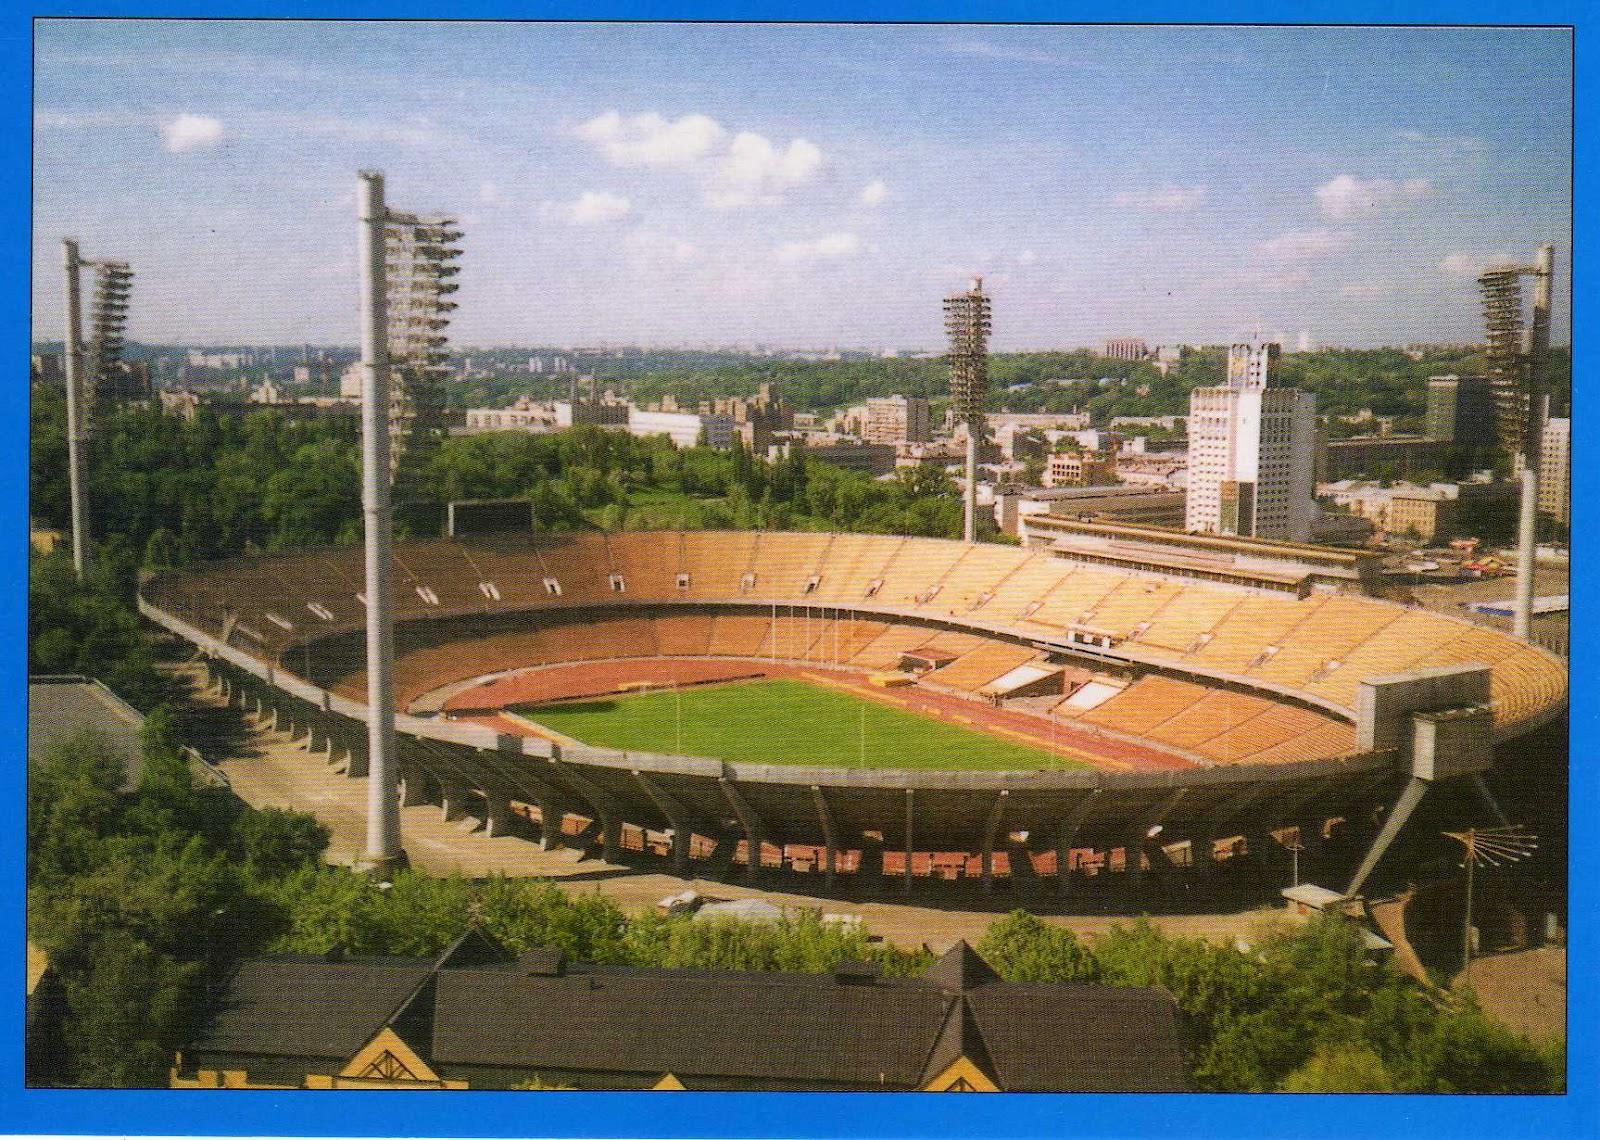 Kiew Stadion